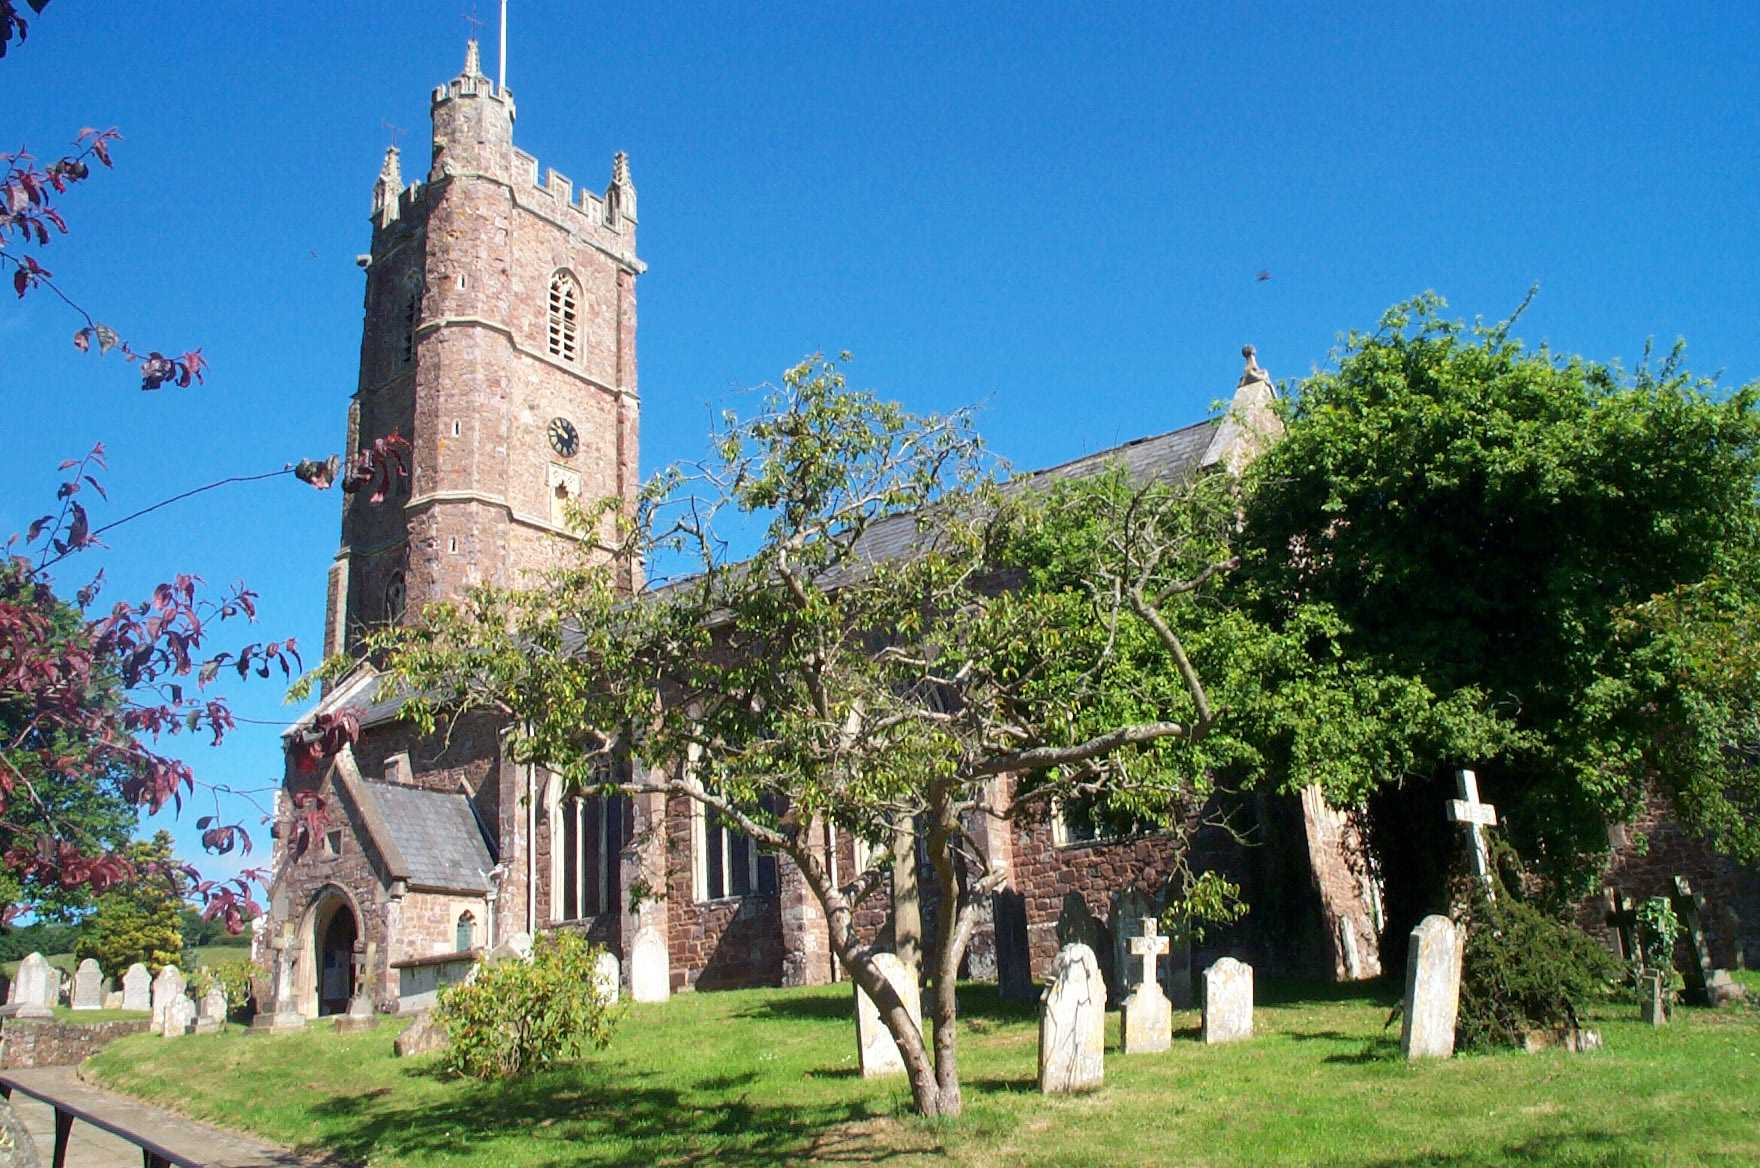 St Disens Church, Bradninch